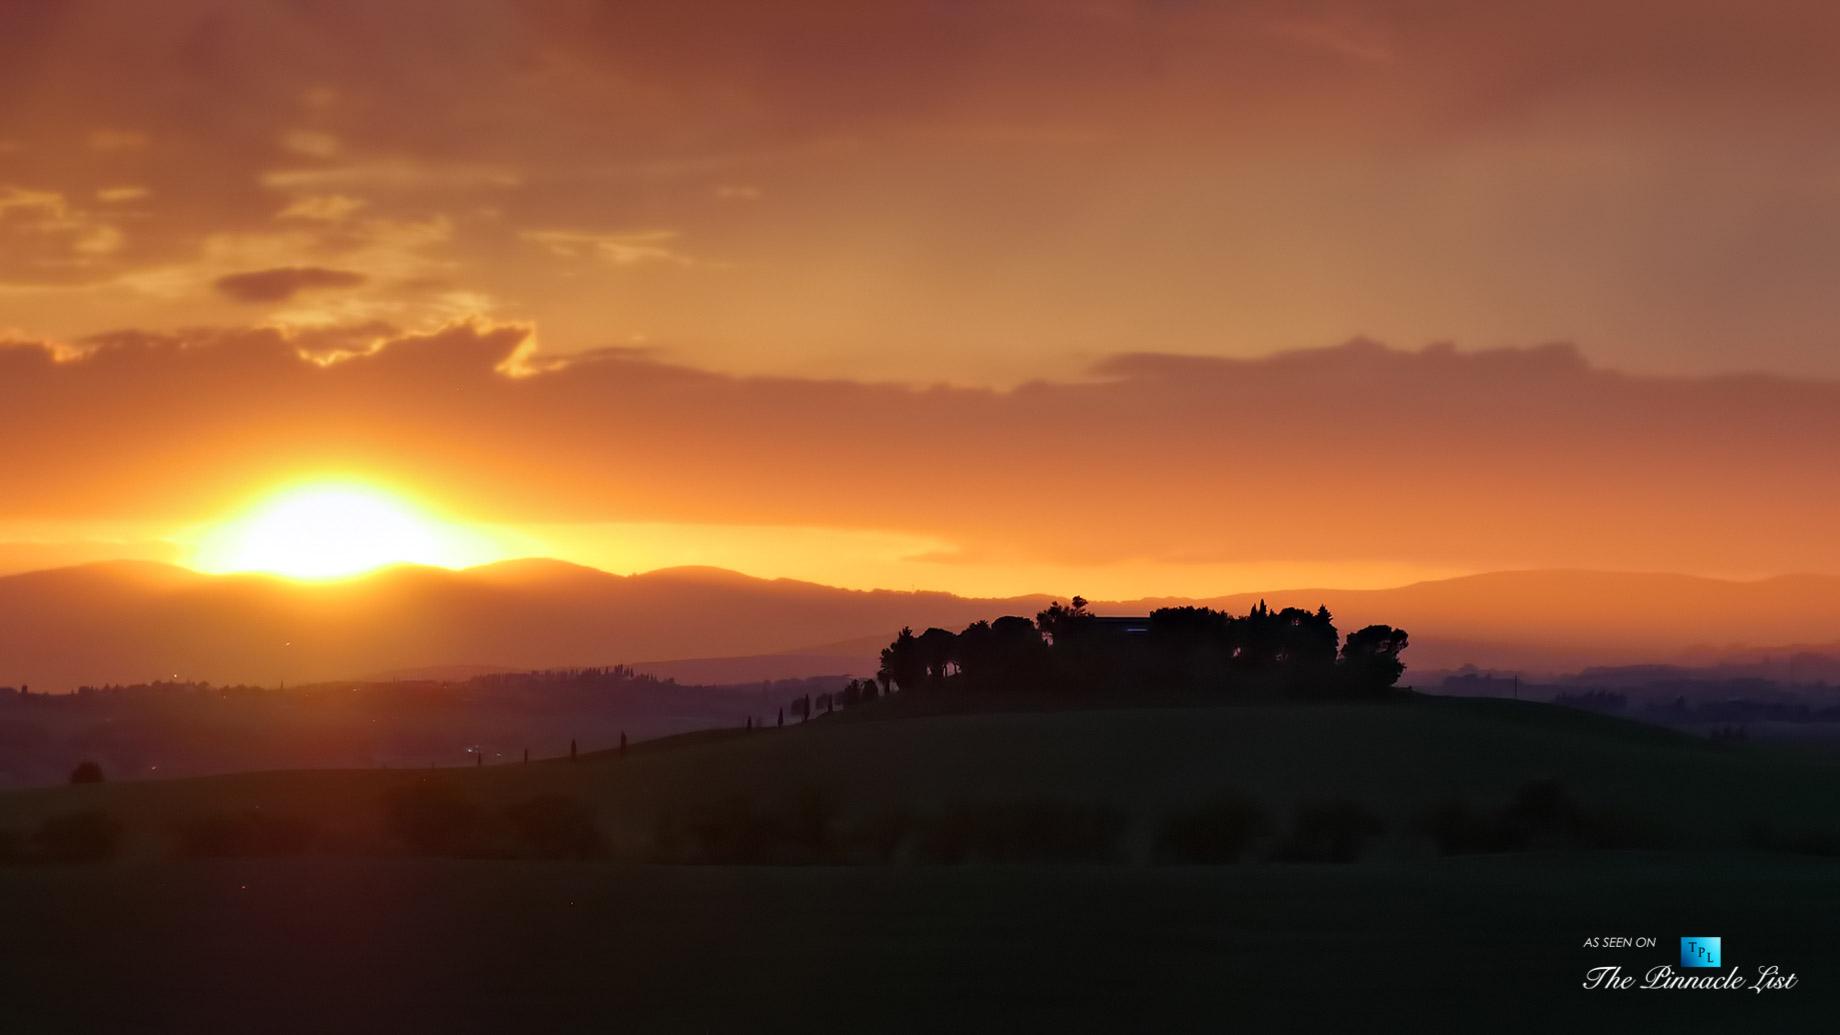 Podere Paníco Estate - Monteroni d'Arbia, Tuscany, Italy - Sunset Property View - Luxury Real Estate - Tuscan Villa